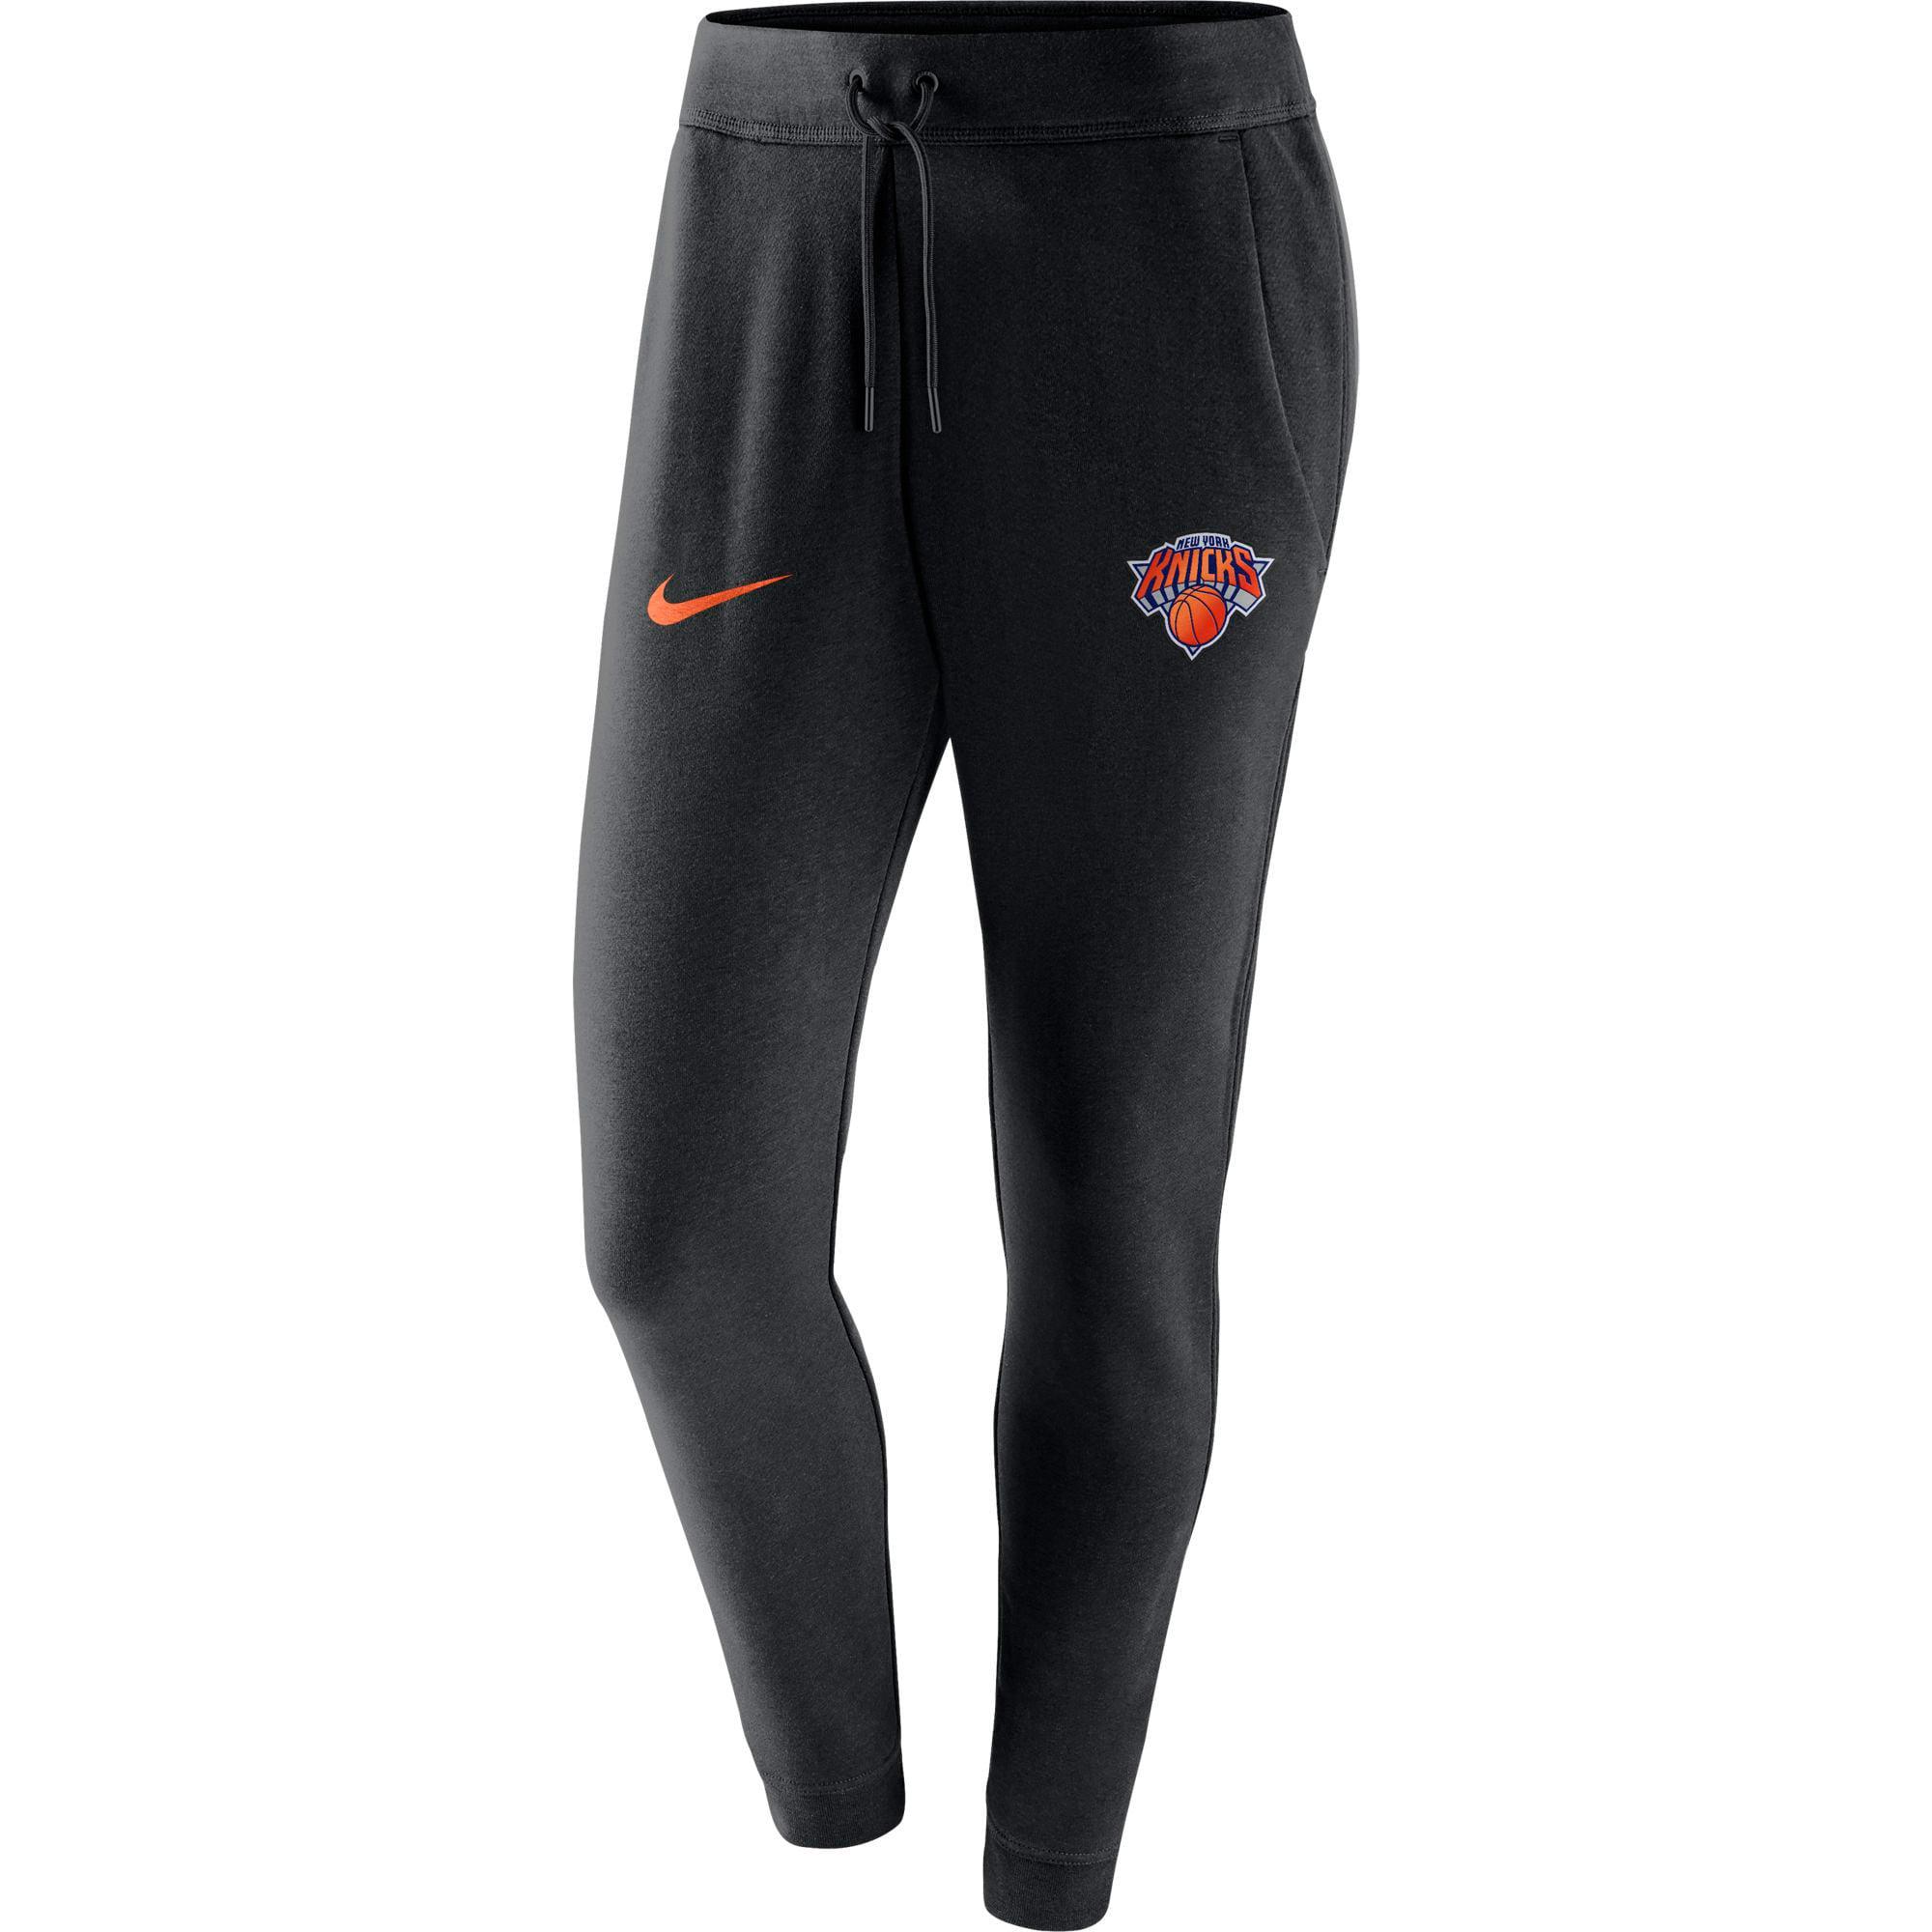 New York Knicks Nike Women's Modern Pant - Black